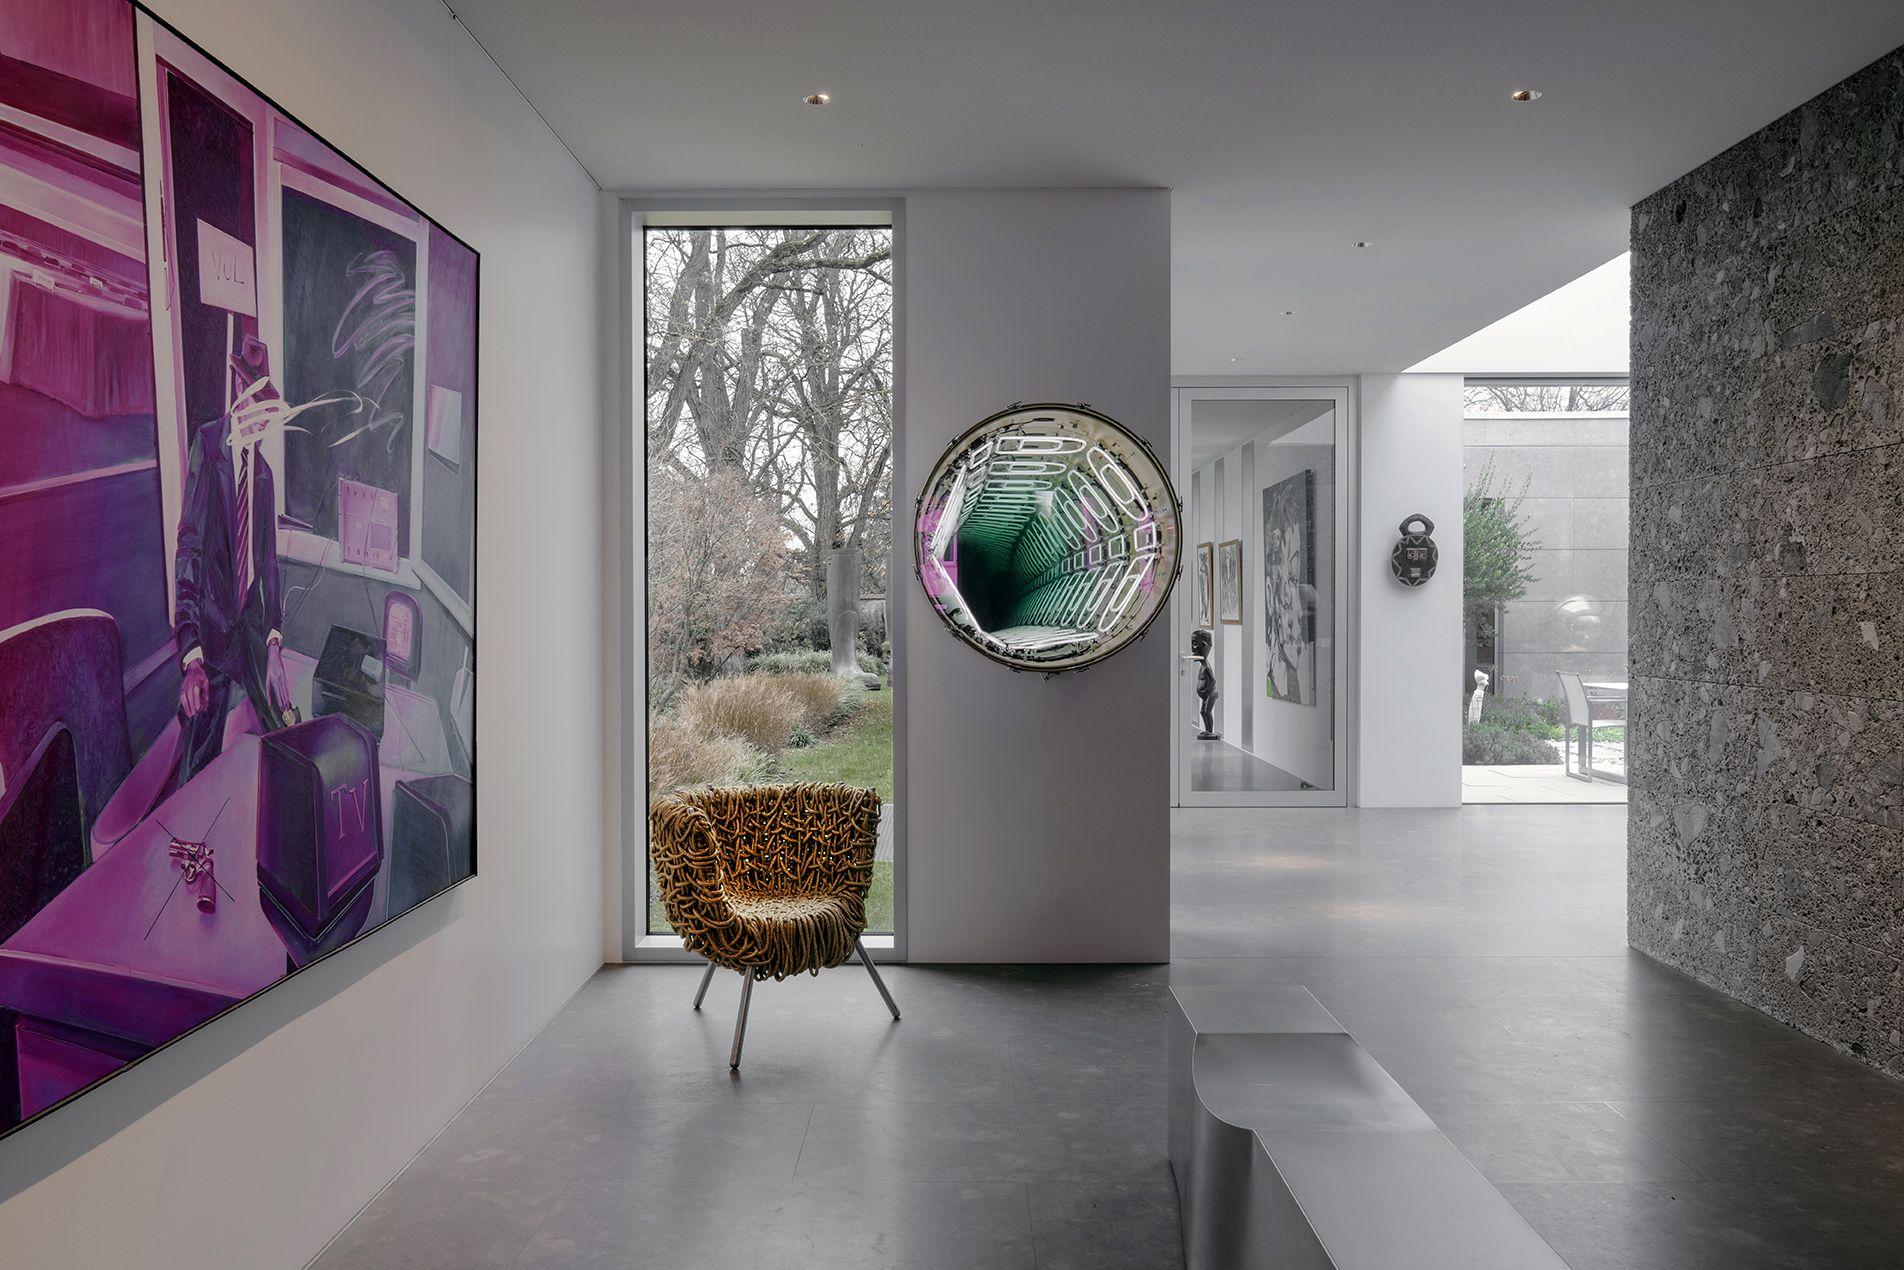 Villa in Svizzera - image 11